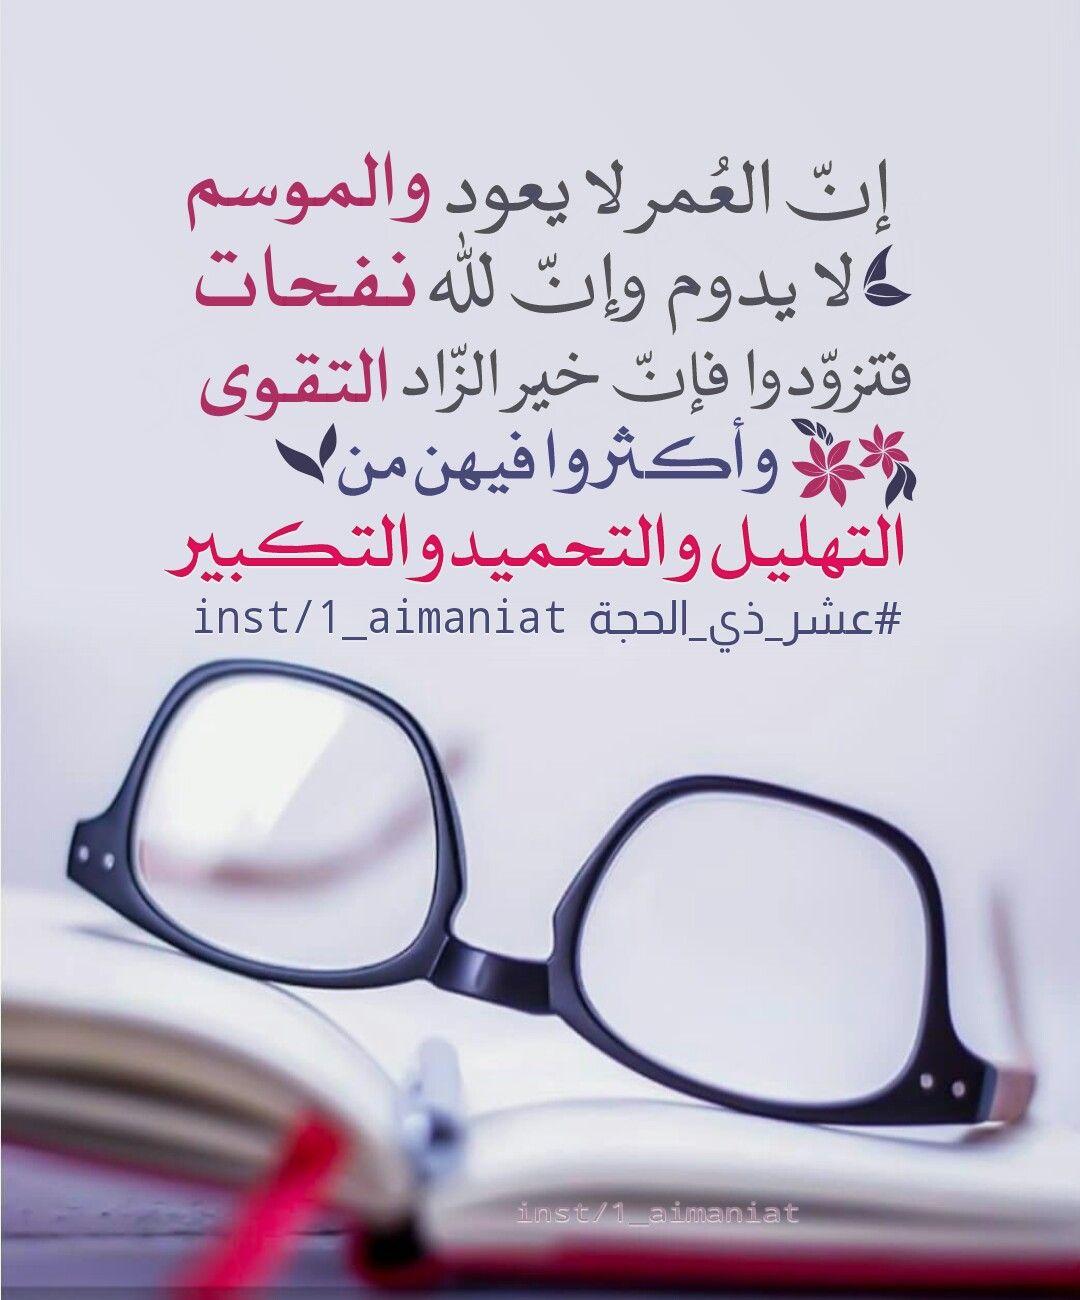 ﺍﻷﻋﻤﺎﻝ ﺍﻟﺼﺎﻟﺤﺔ ﻓﻲ ﺍﻟﻌﺸﺮ 1 ﺍﻟﺼﻼﺓ 2 ﺍﻟﺼﻴﺎﻡ 3 ﺍﻟﺼﺪﻗﺔ 4 ﺍﻟﺬﻛﺮ ﺍﻟﺘﻜﺒﻴﺮ 5 ﻗﺮﺍﺀﺓ ﺍﻟﻘﺮﺁﻥ 6 ﺻﻠﺔ ﺍﻟﺮﺣﻢ 7 ﺑ ﺮ ﺍﻟﻮﺍﻟﺪﻳﻦ 8 ﺍﻟﺤﺞ ﻭﺍﻟﻌ Islam